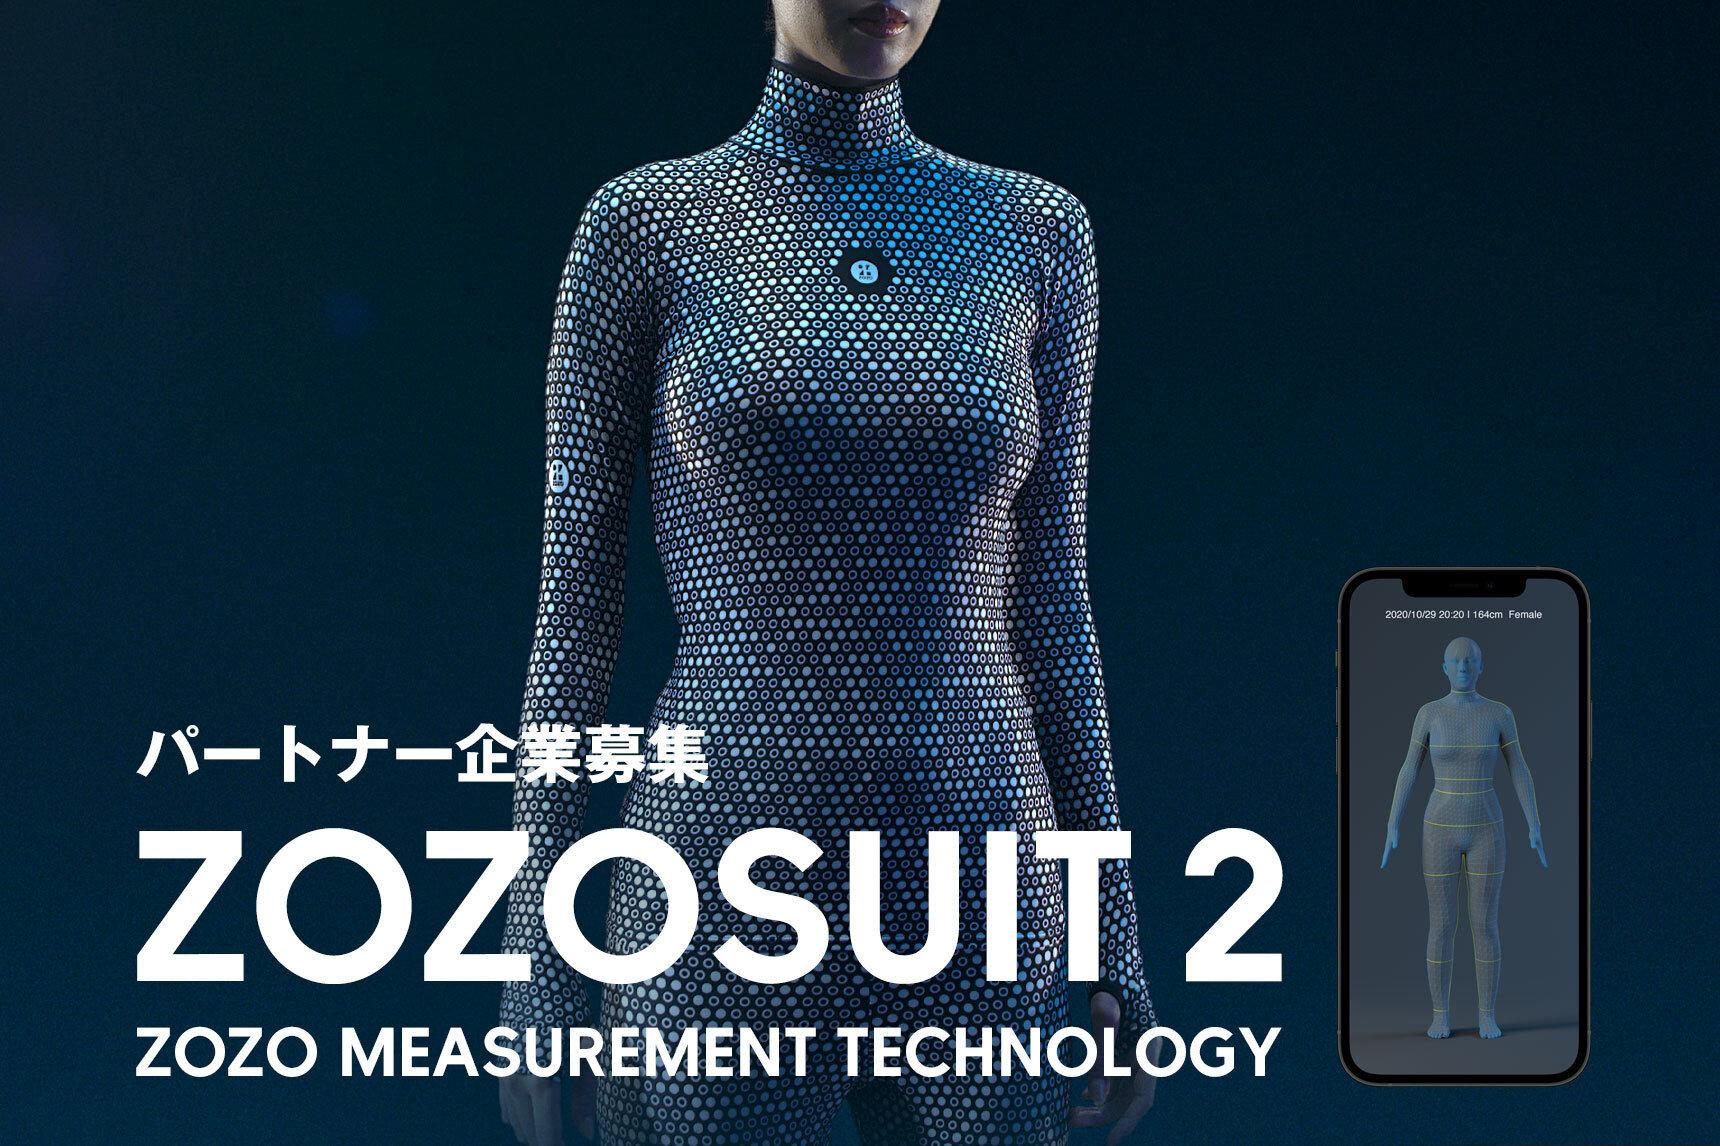 「ZOZOSUIT 2」登場 3D計測の精度向上、アンダーウェアなど開発に活用